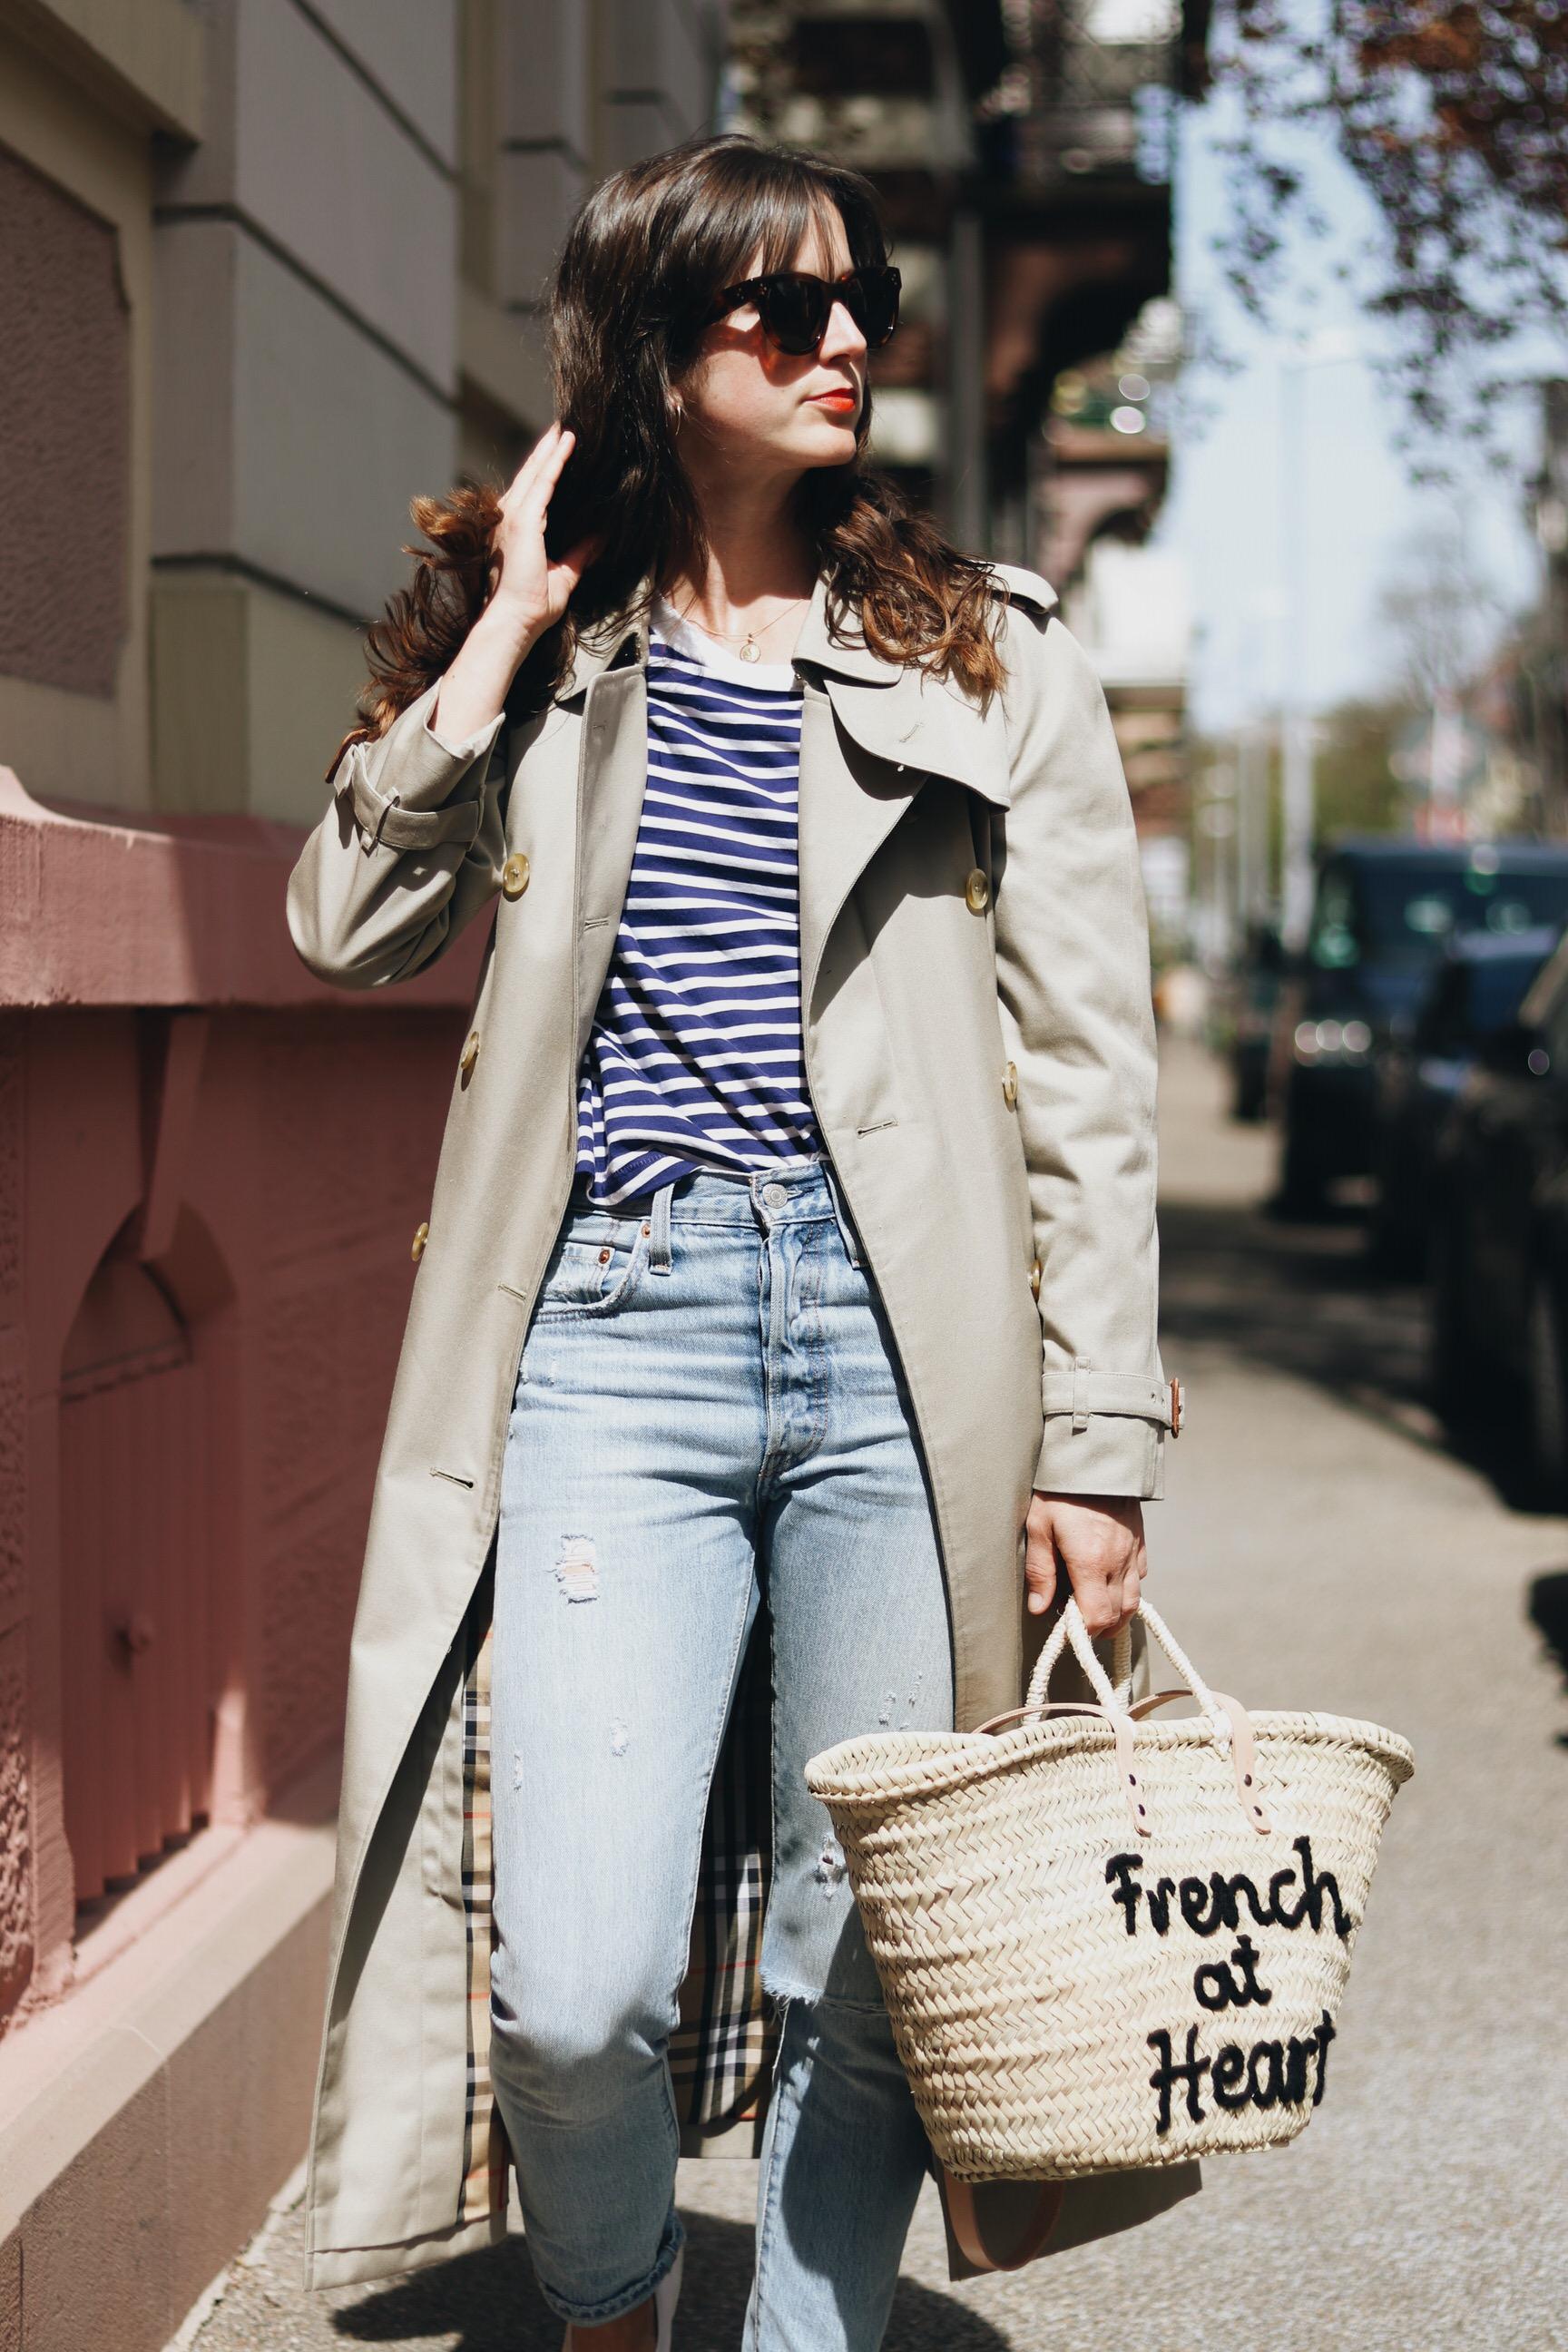 Blog Outfit Korbtasche Trenchcoat Streifen Mom Jeans Fruehling Modetrends